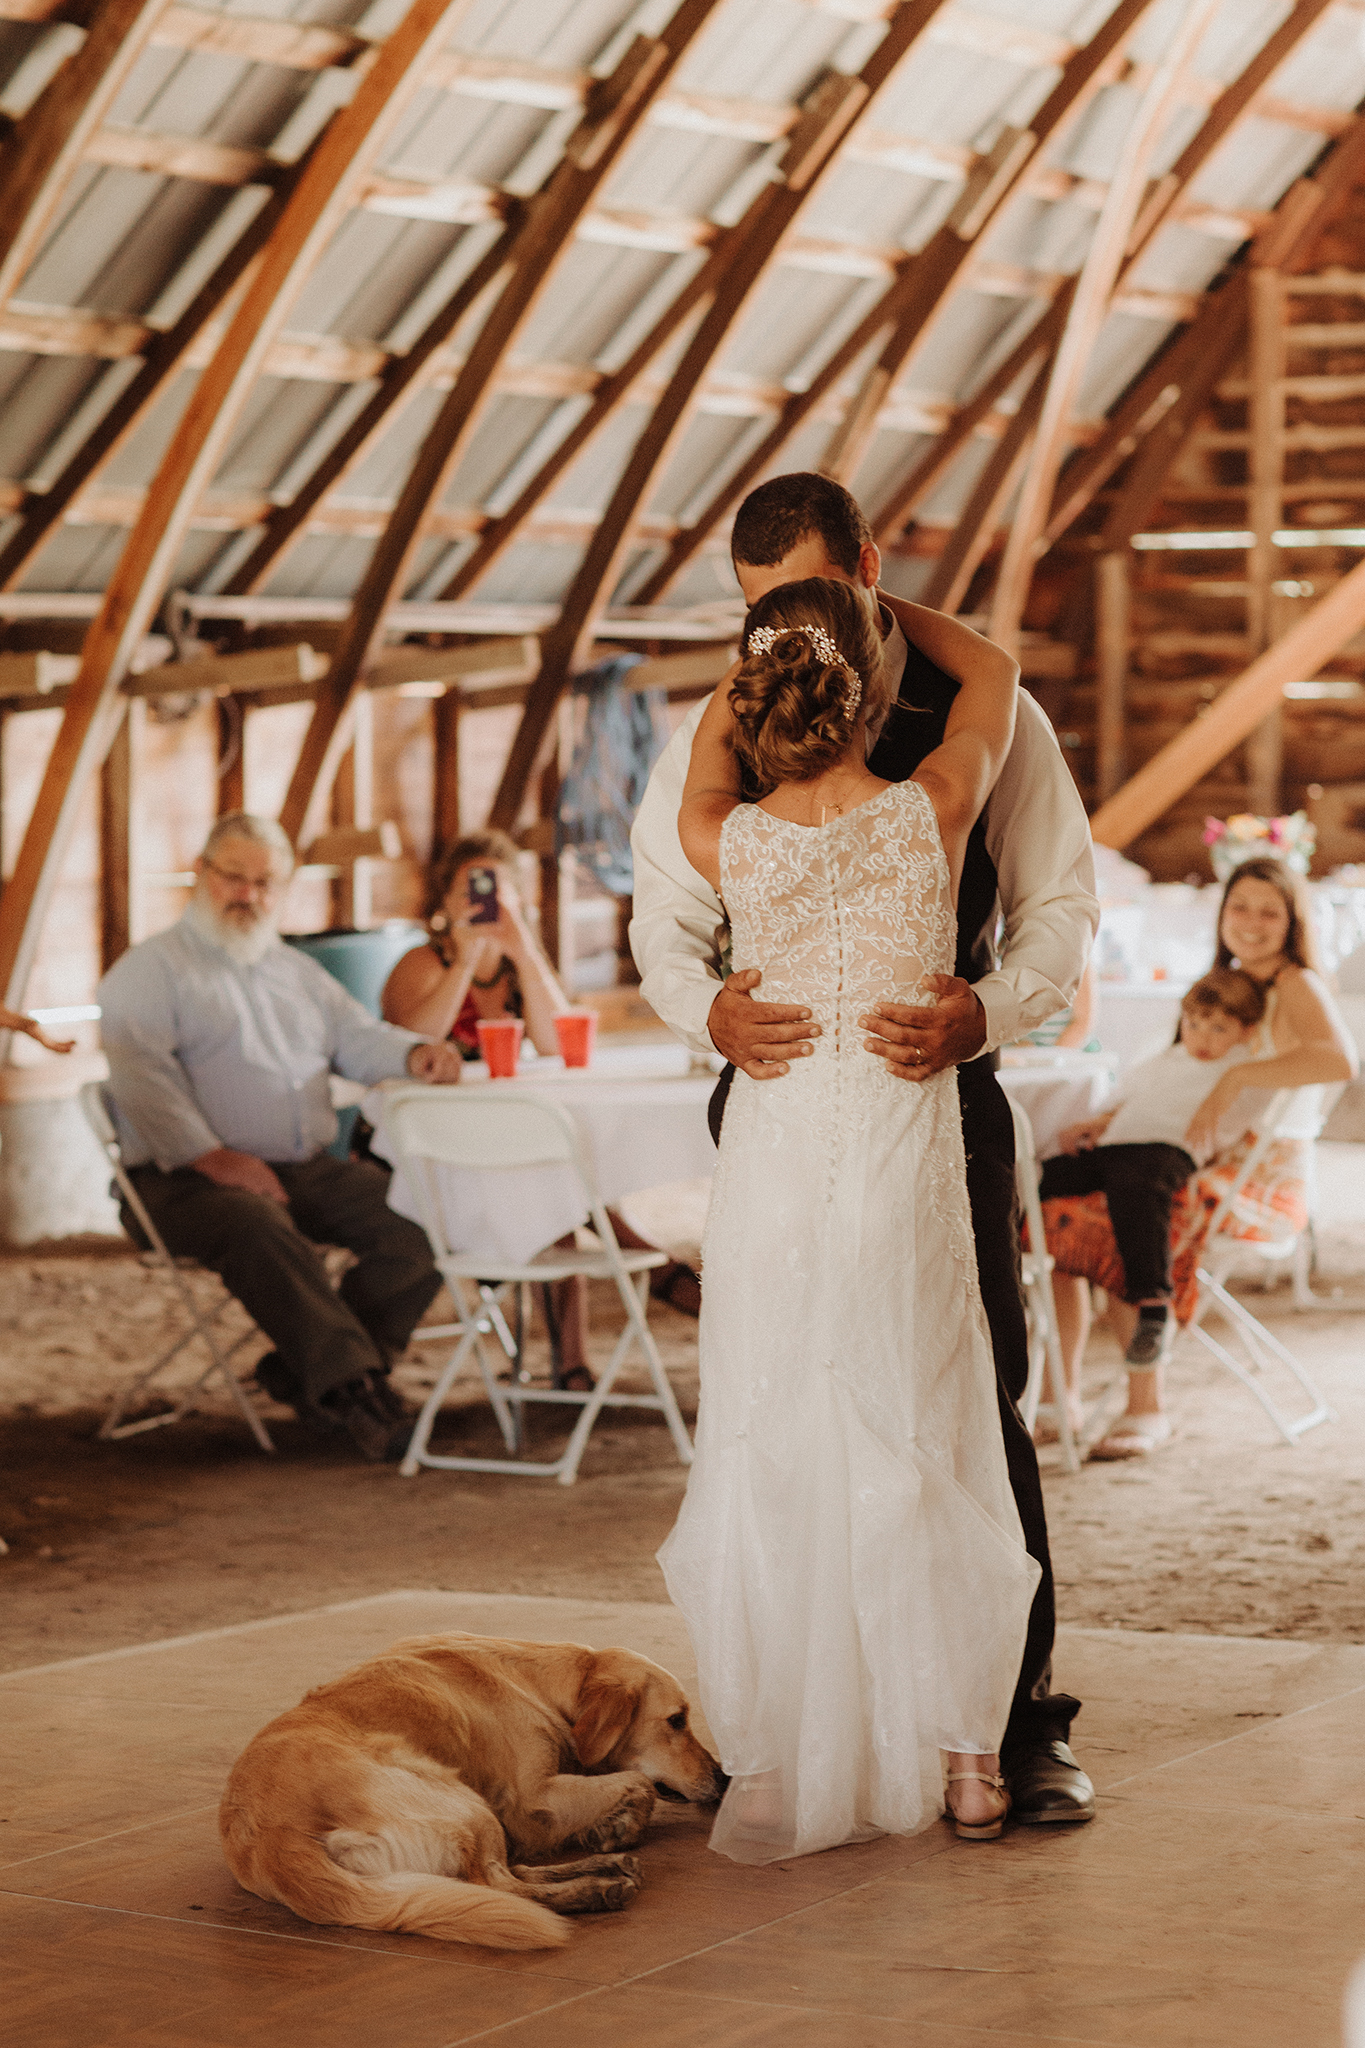 vermont-wedding-photographer-outdoor-farm-wedding-44.jpg